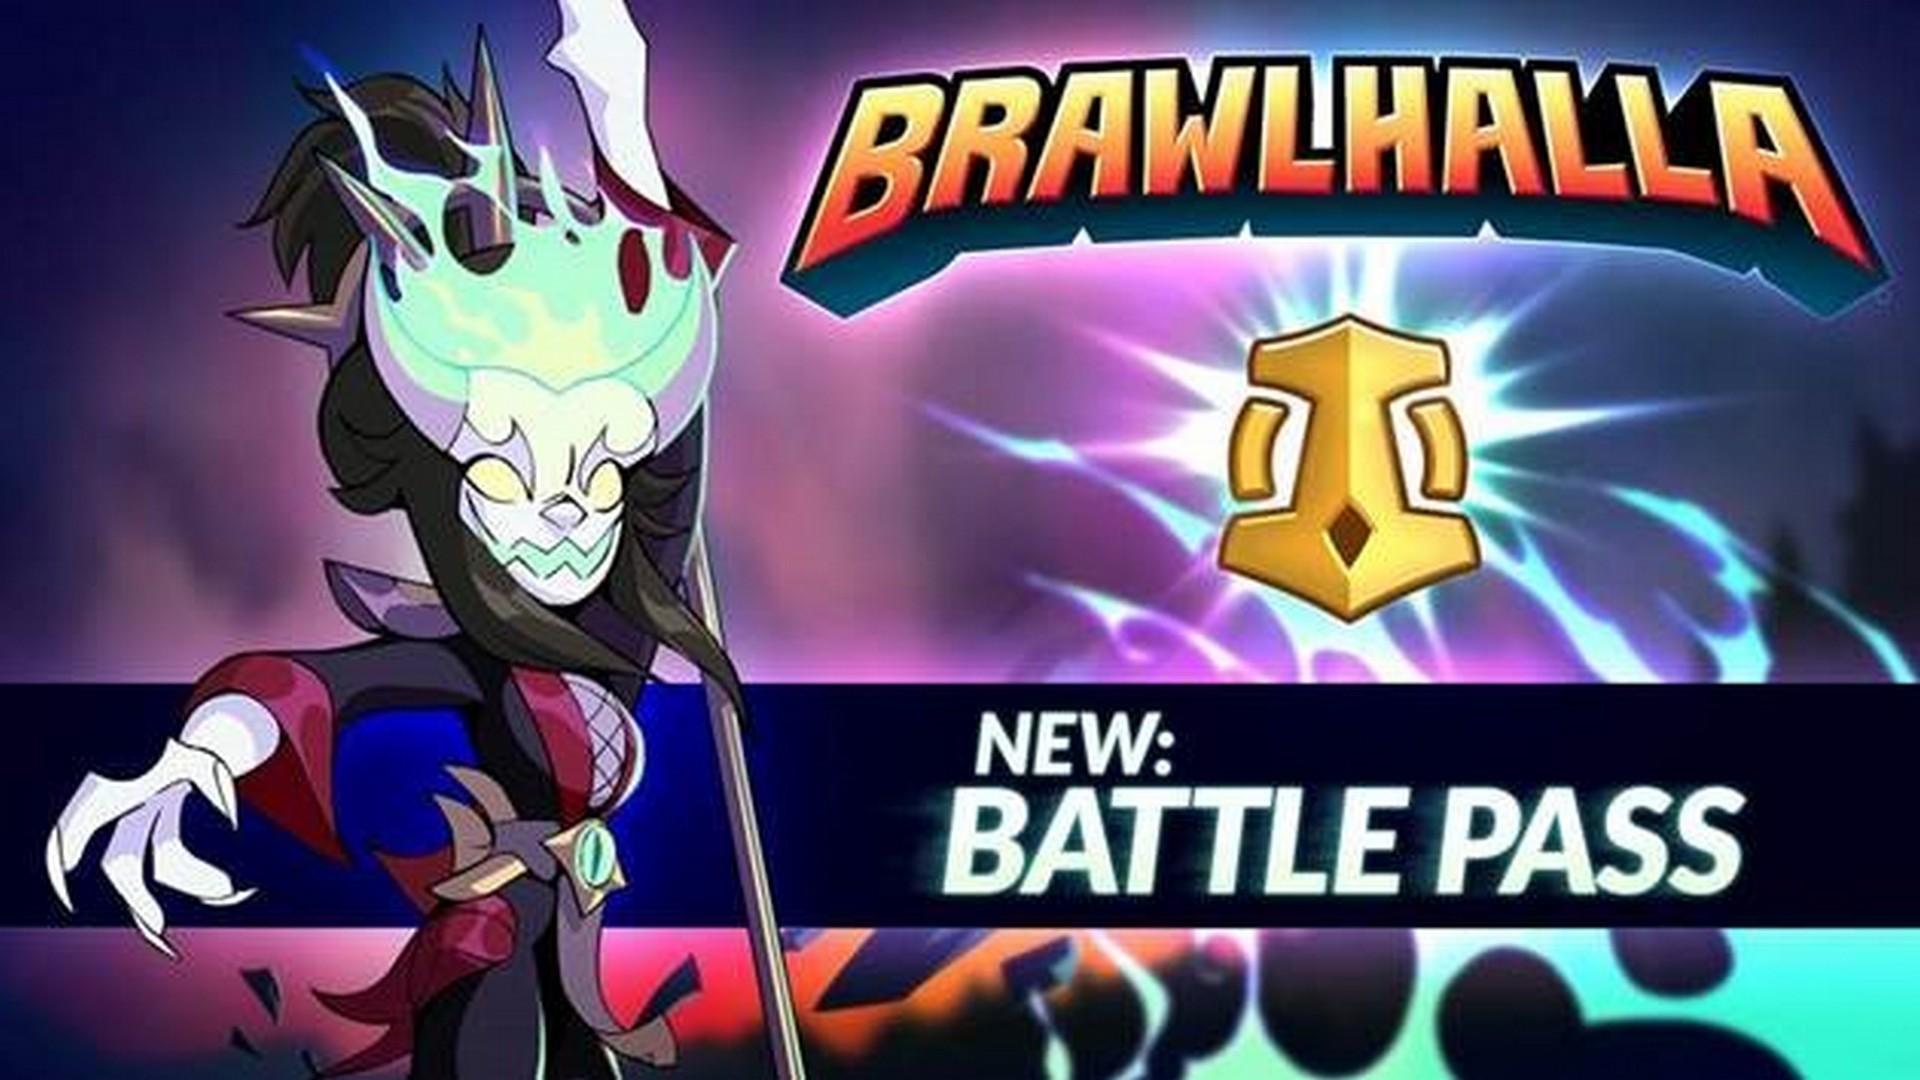 BRAWLHALLA Announces Battle Pass